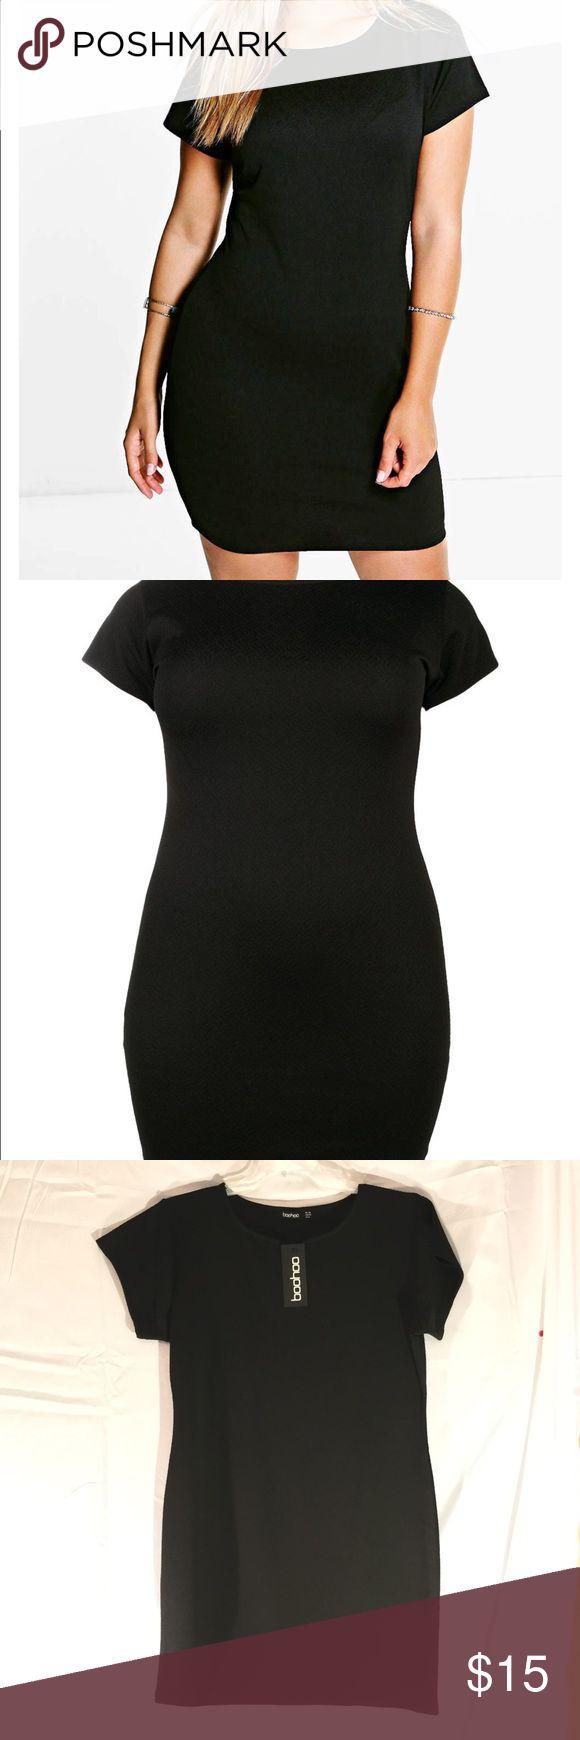 Textured fabric mini dress, Black, Size 16 Black plus size mini dress, Size 16, NWT, Polyester, lightweight material Boohoo Plus Dresses Mini